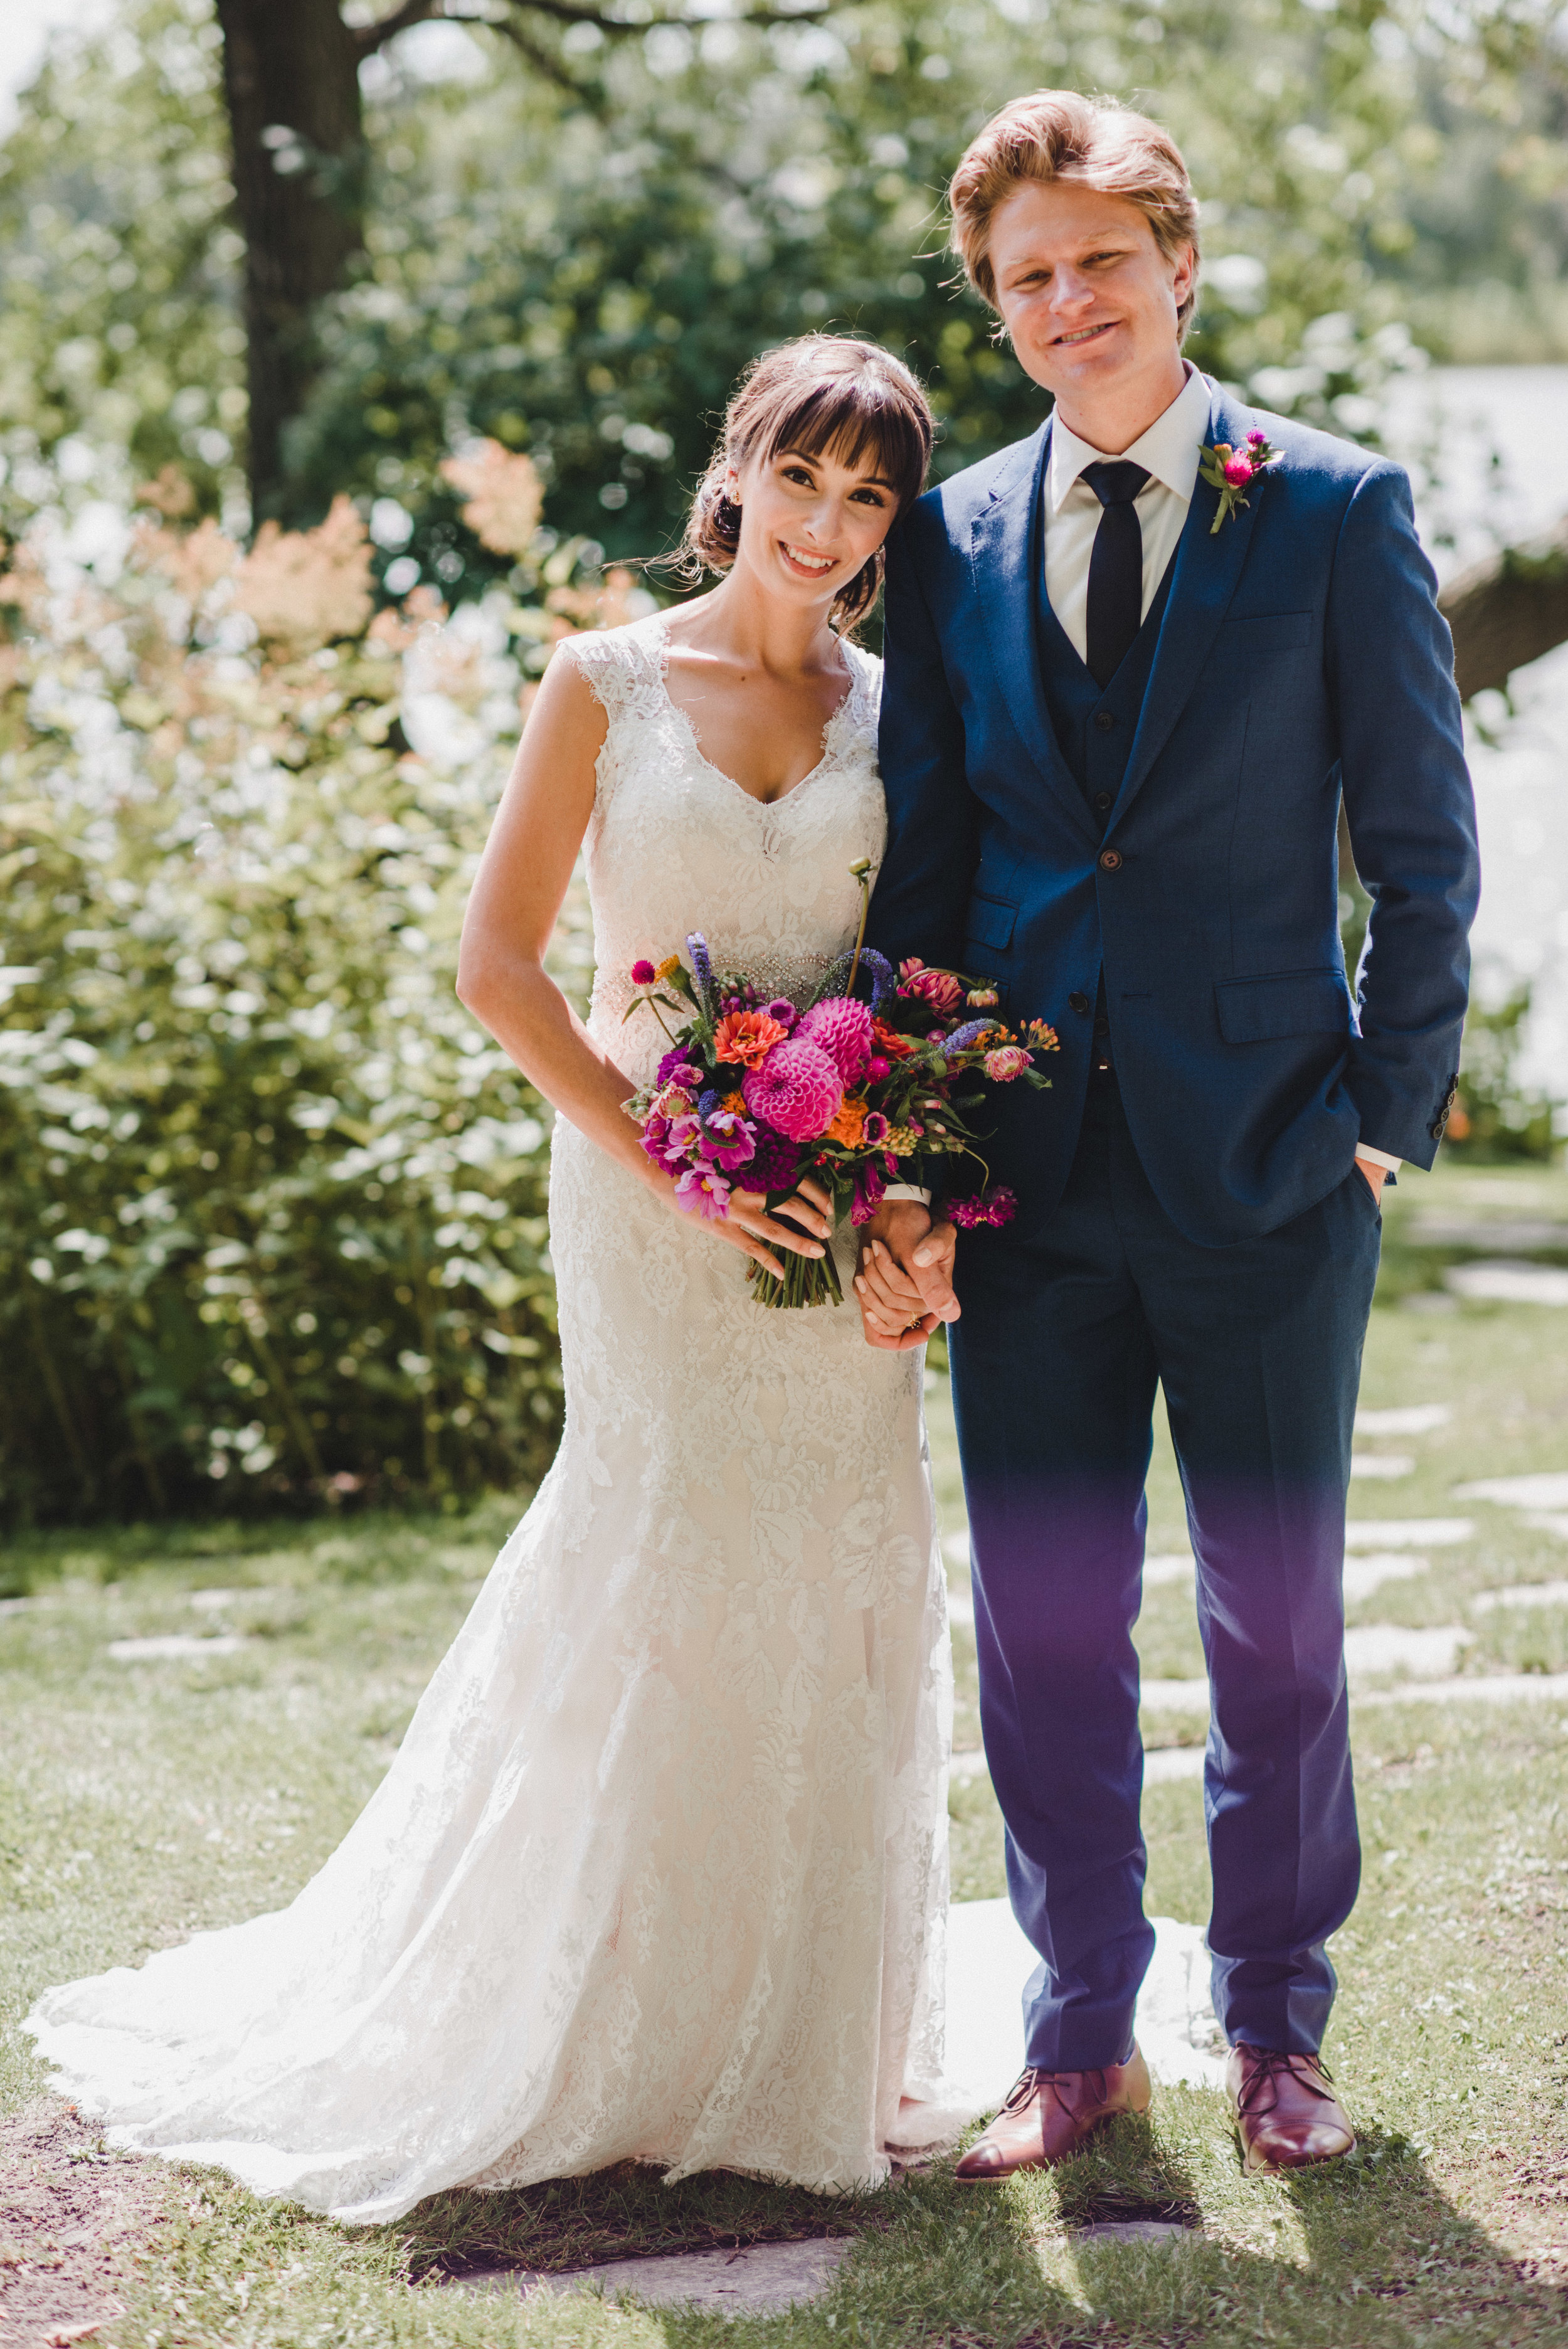 Vibrant Wedding Flower Ideas - Stone House Creative